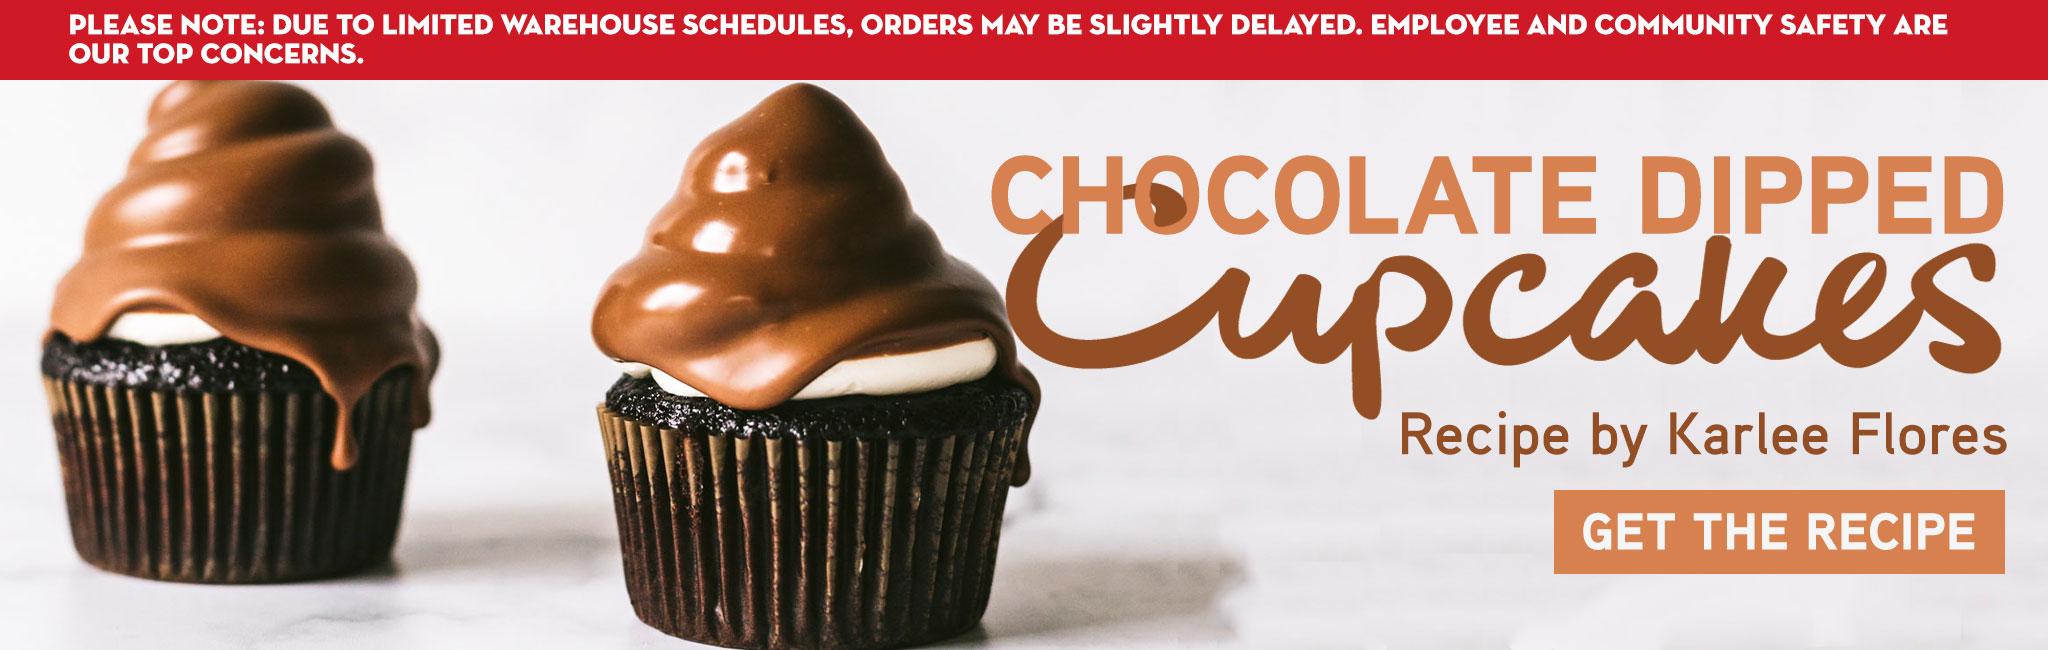 CHOCOLATE DIPPED CUPCAKES